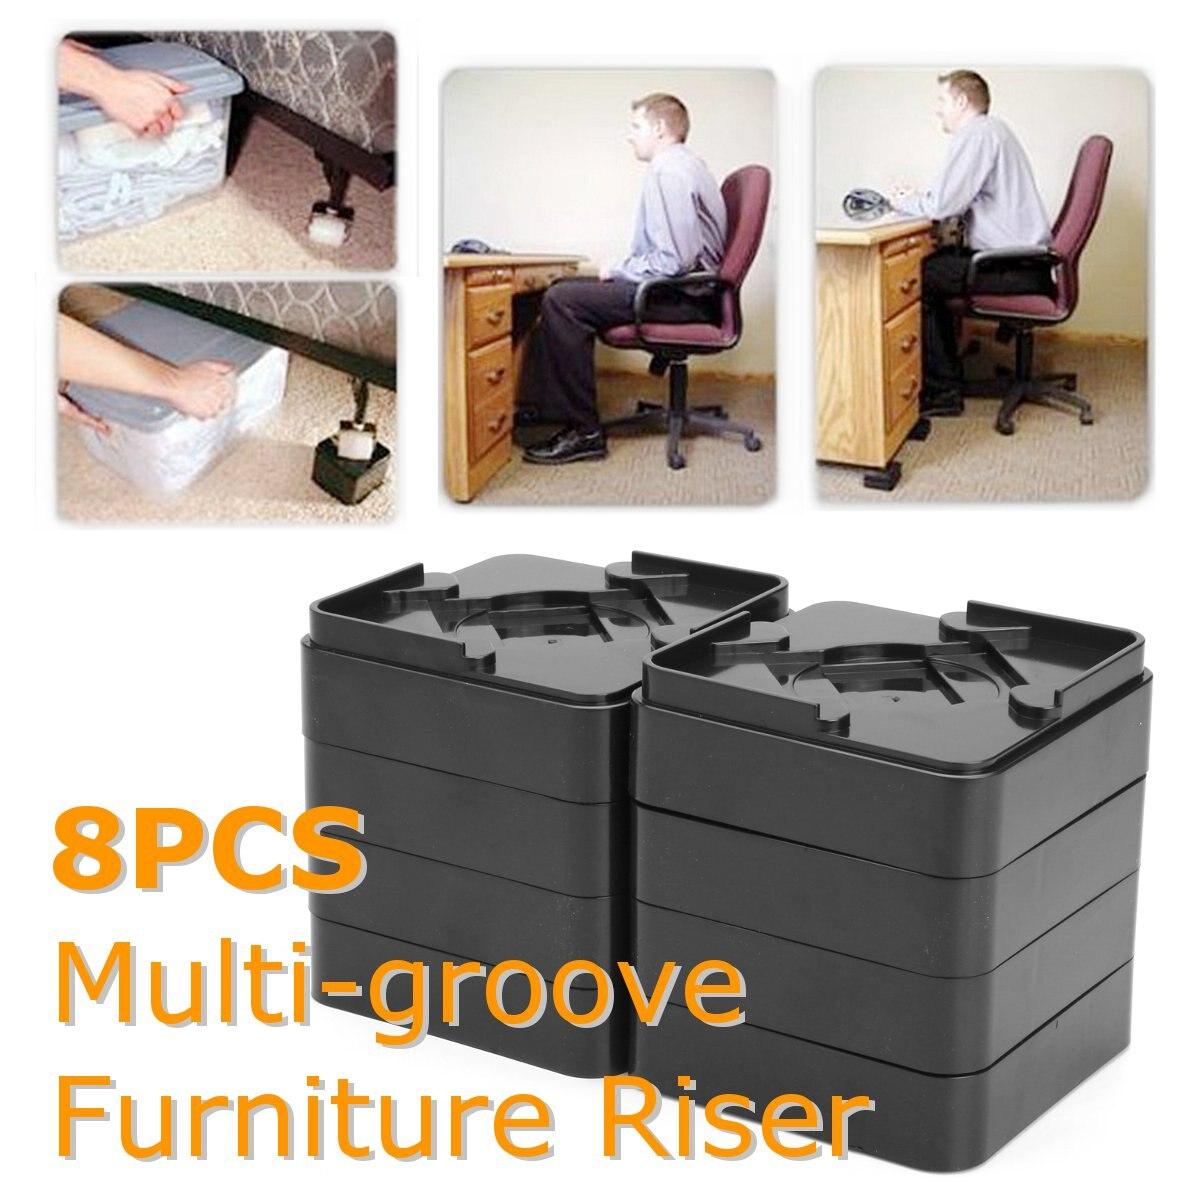 Pcs Bed Risers Lift Table Furniture Homewares Underbed Storage - Furniture risers for desk